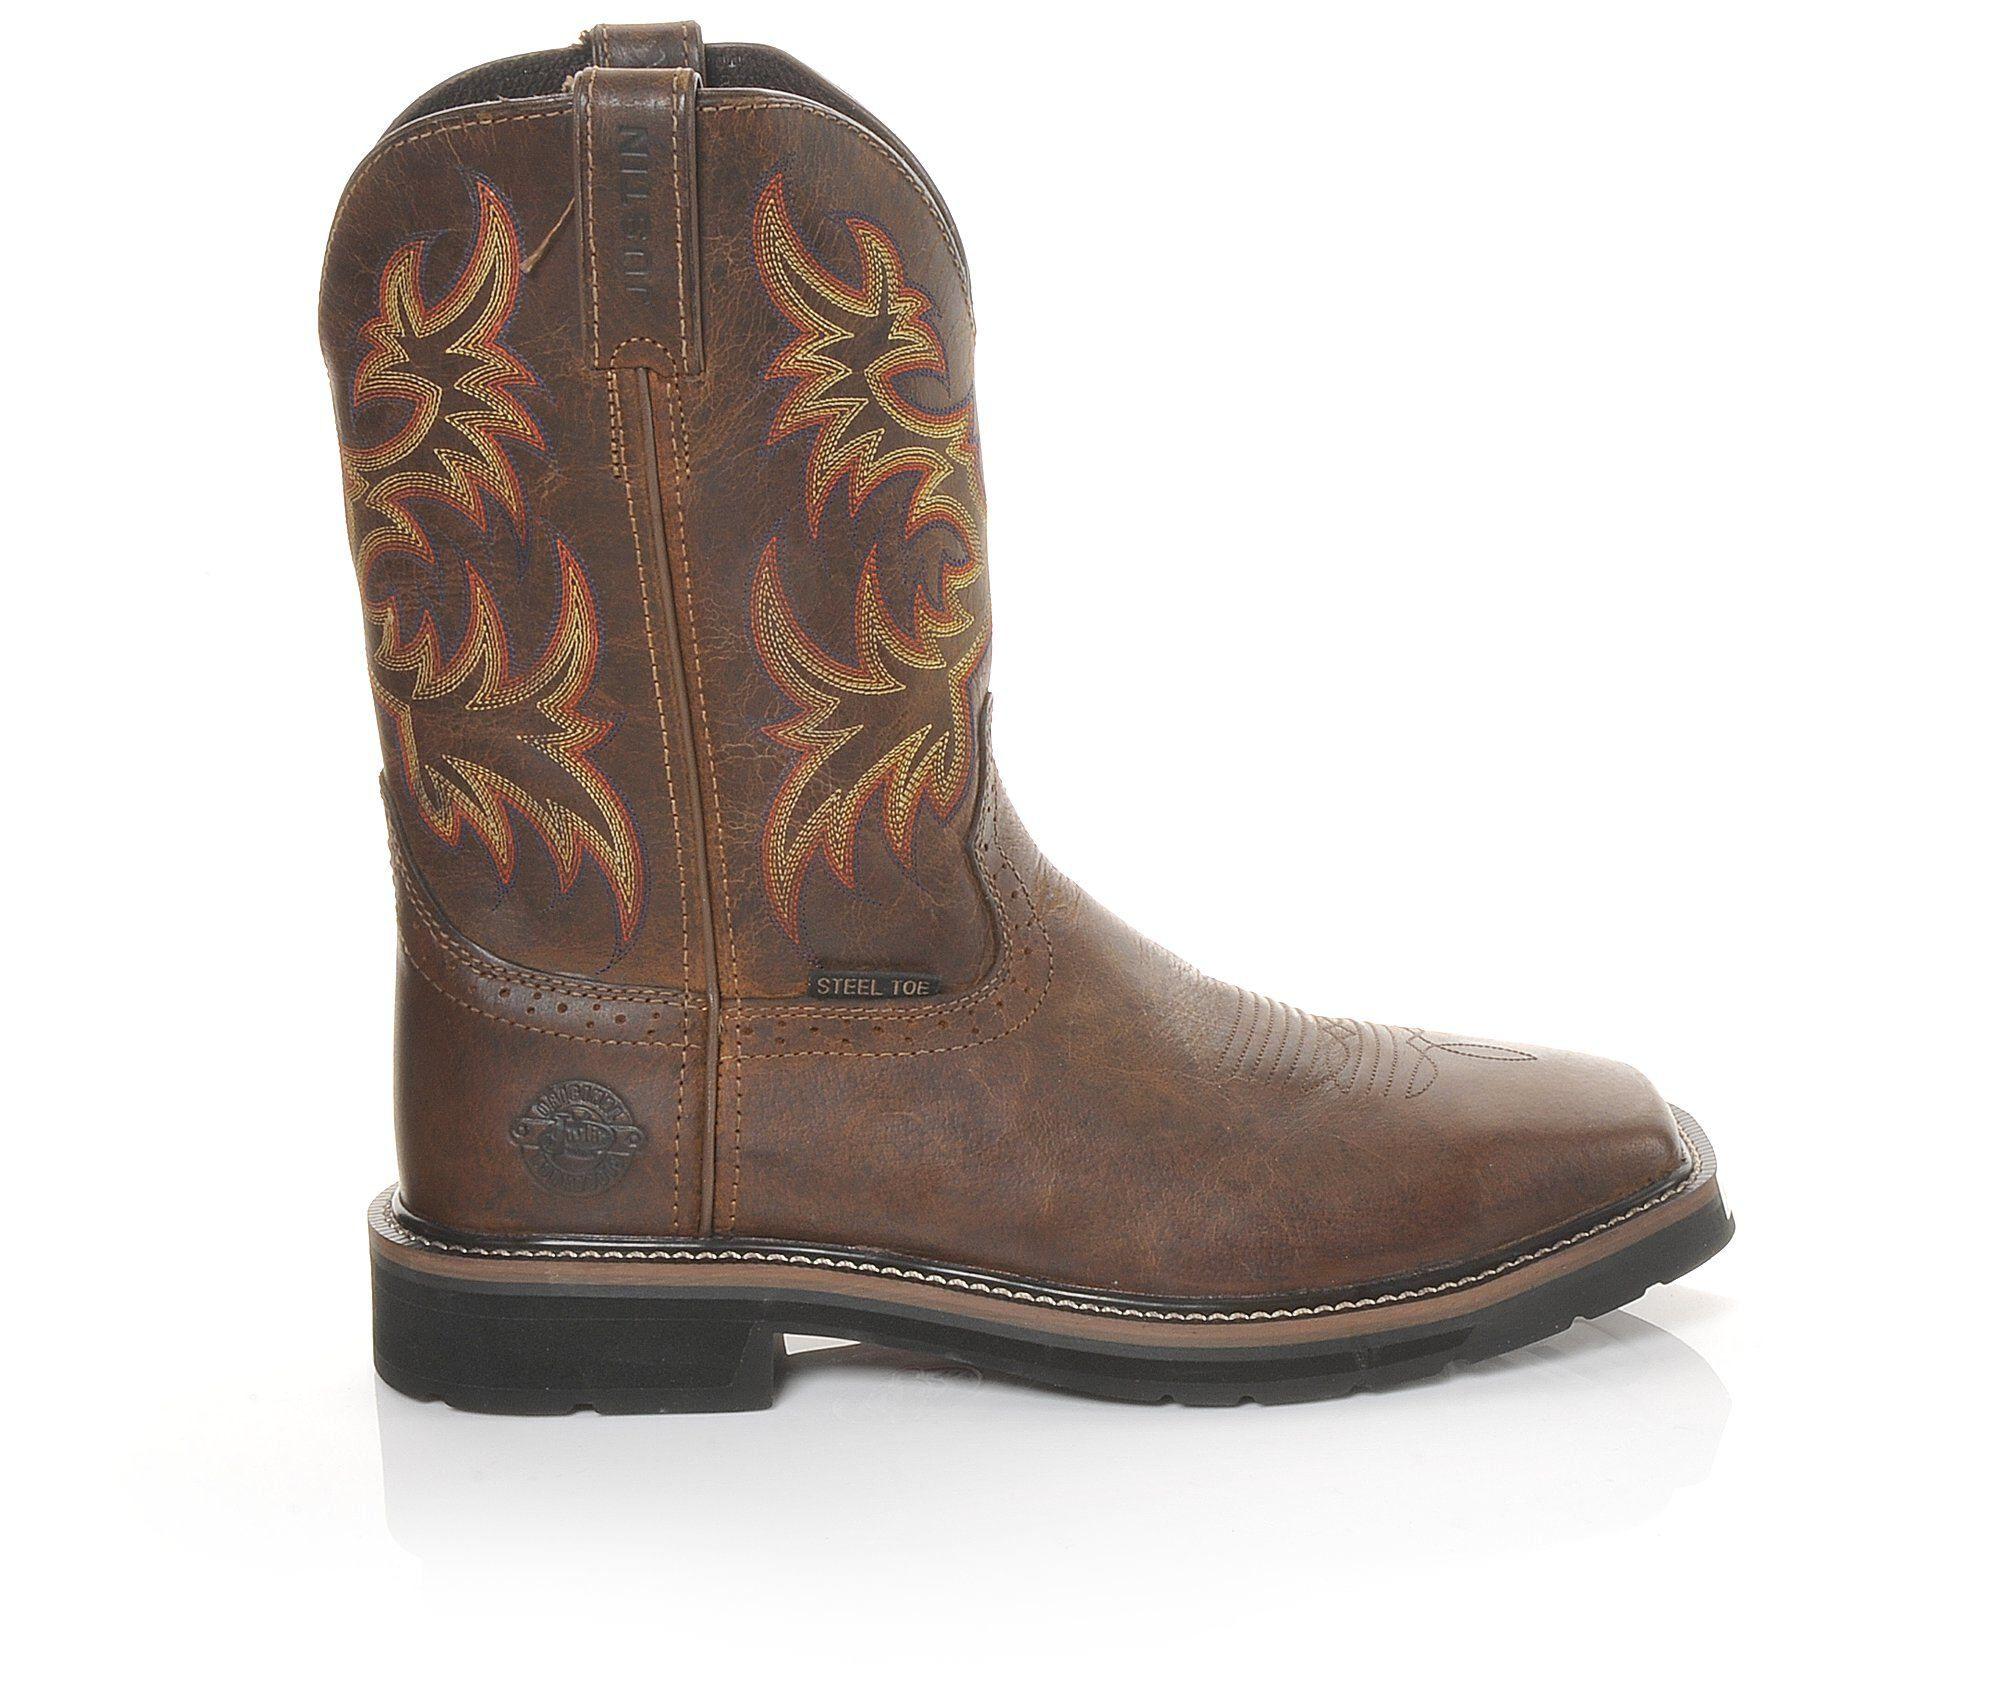 Men's Justin Boots WK4682 Stampede Steel Toe Work Boots Brown